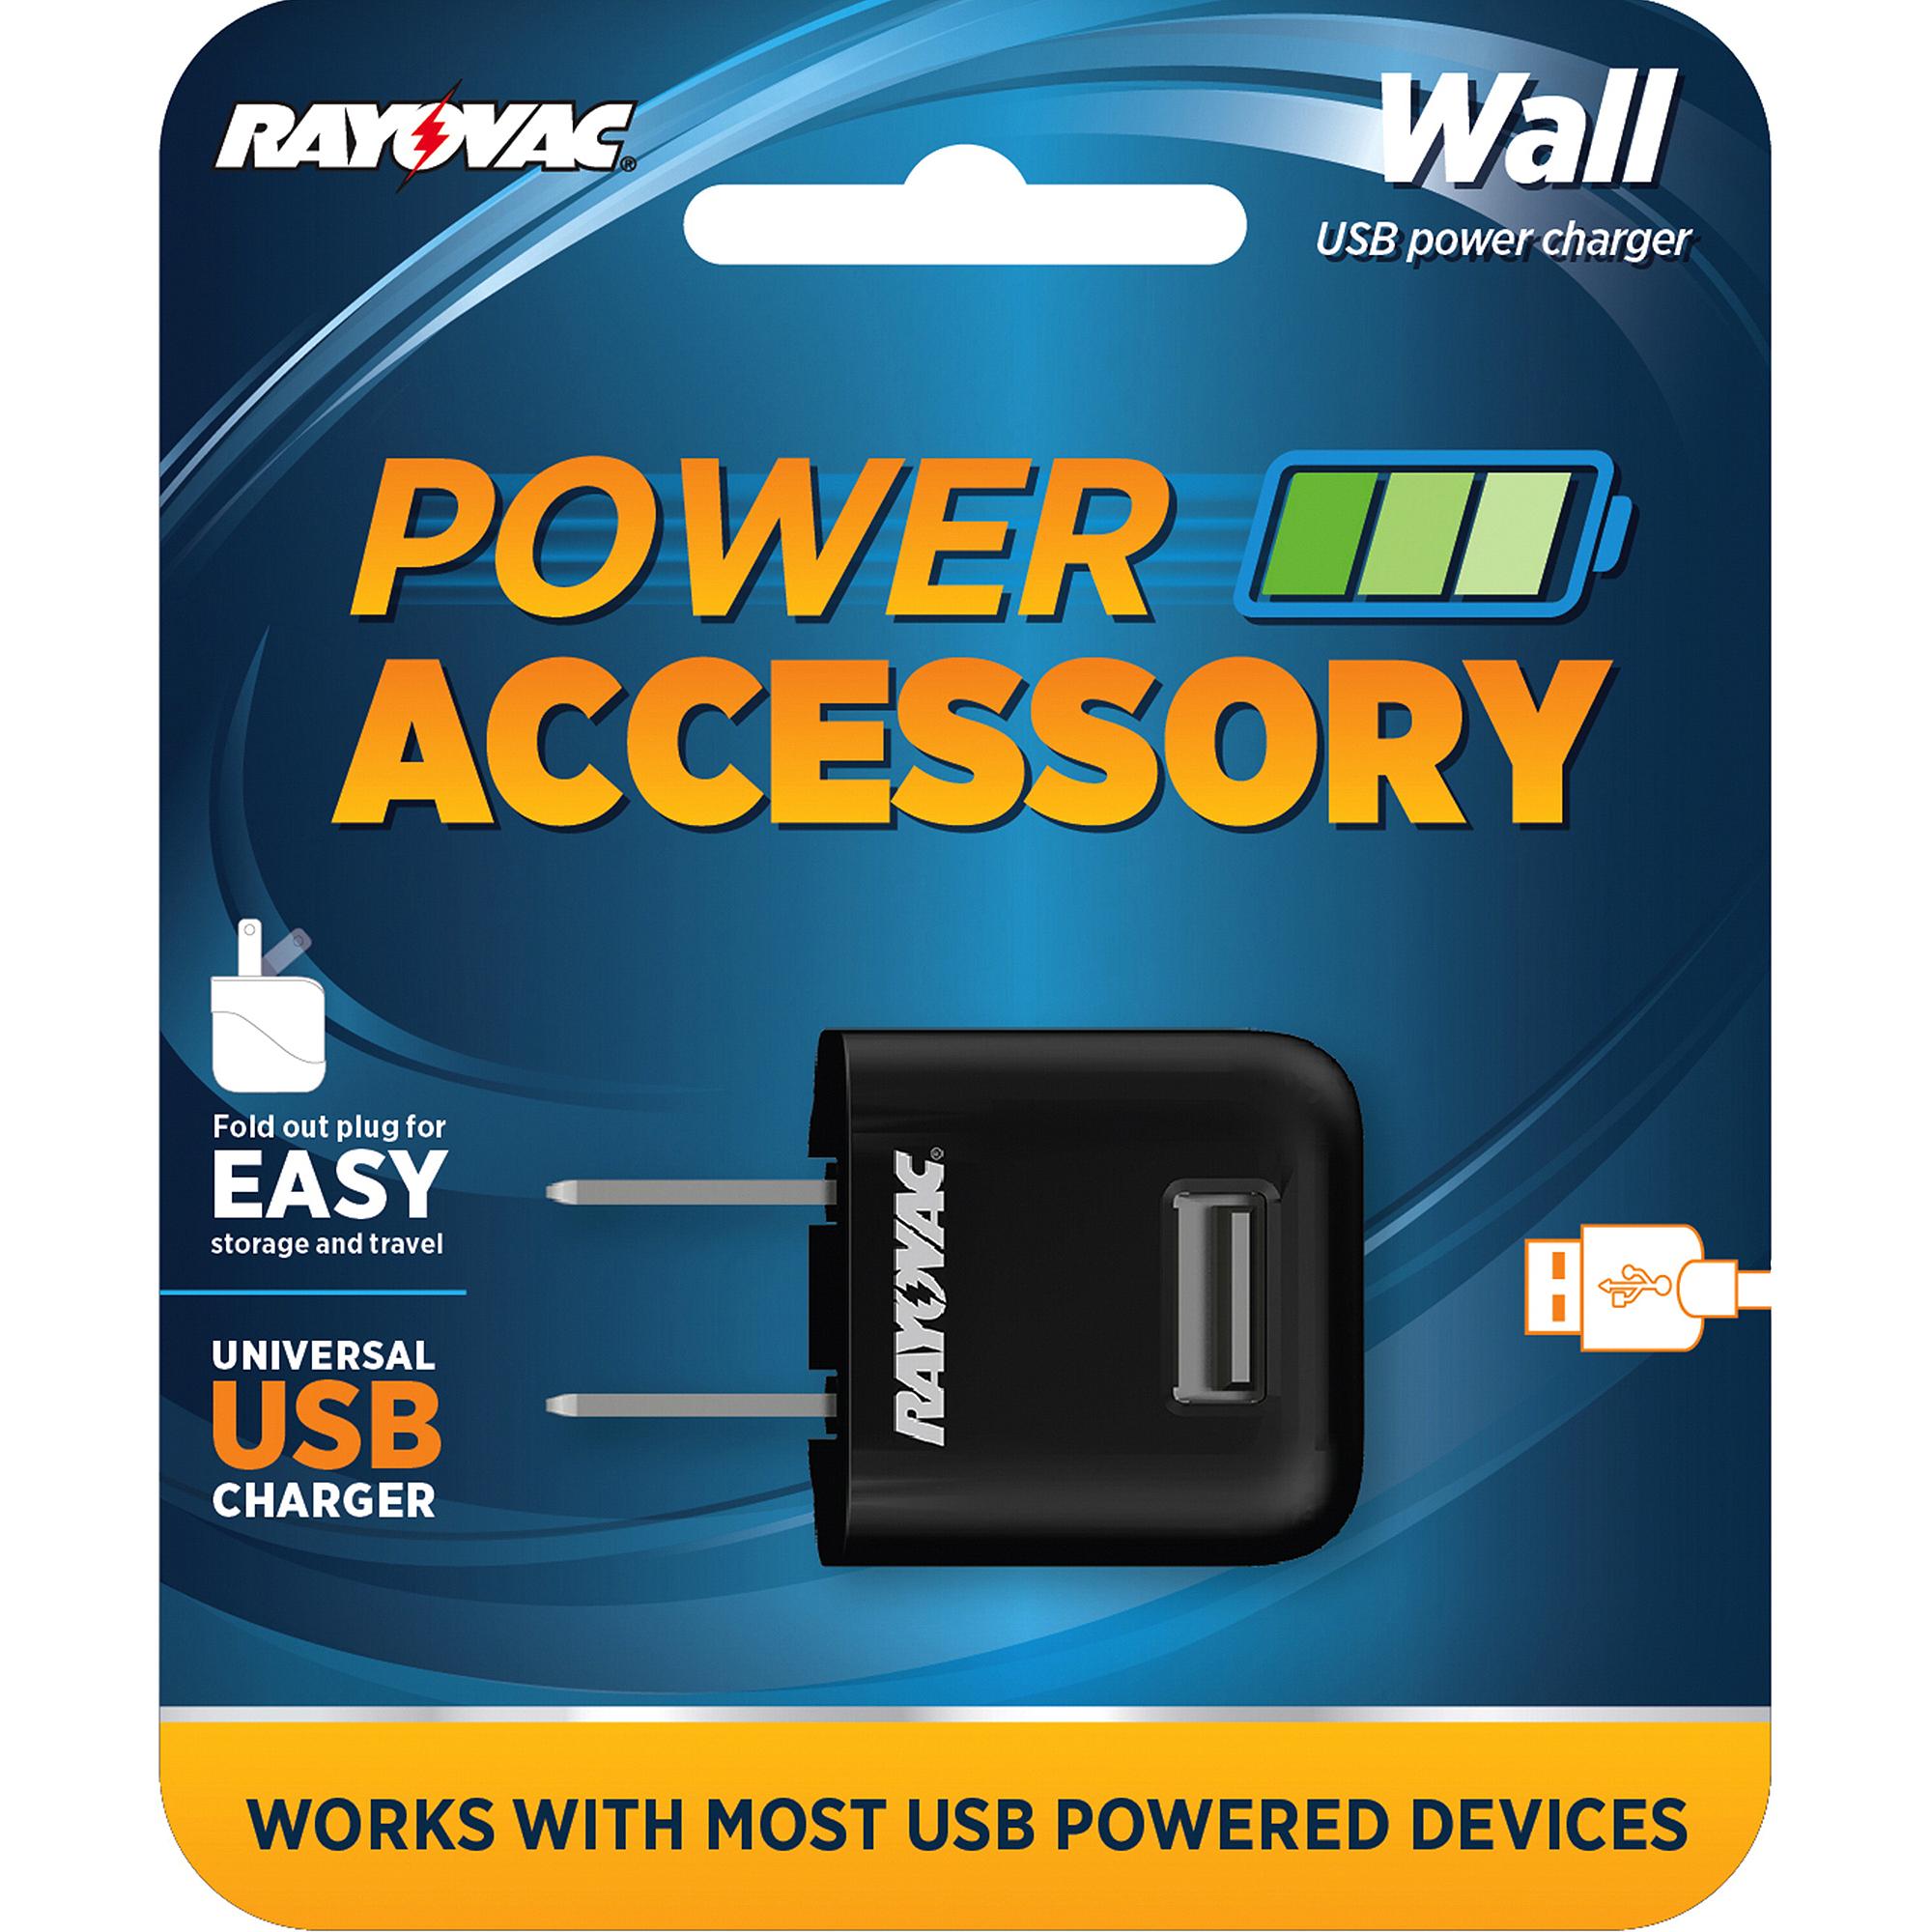 Rayovac Portable USB Wall Charger